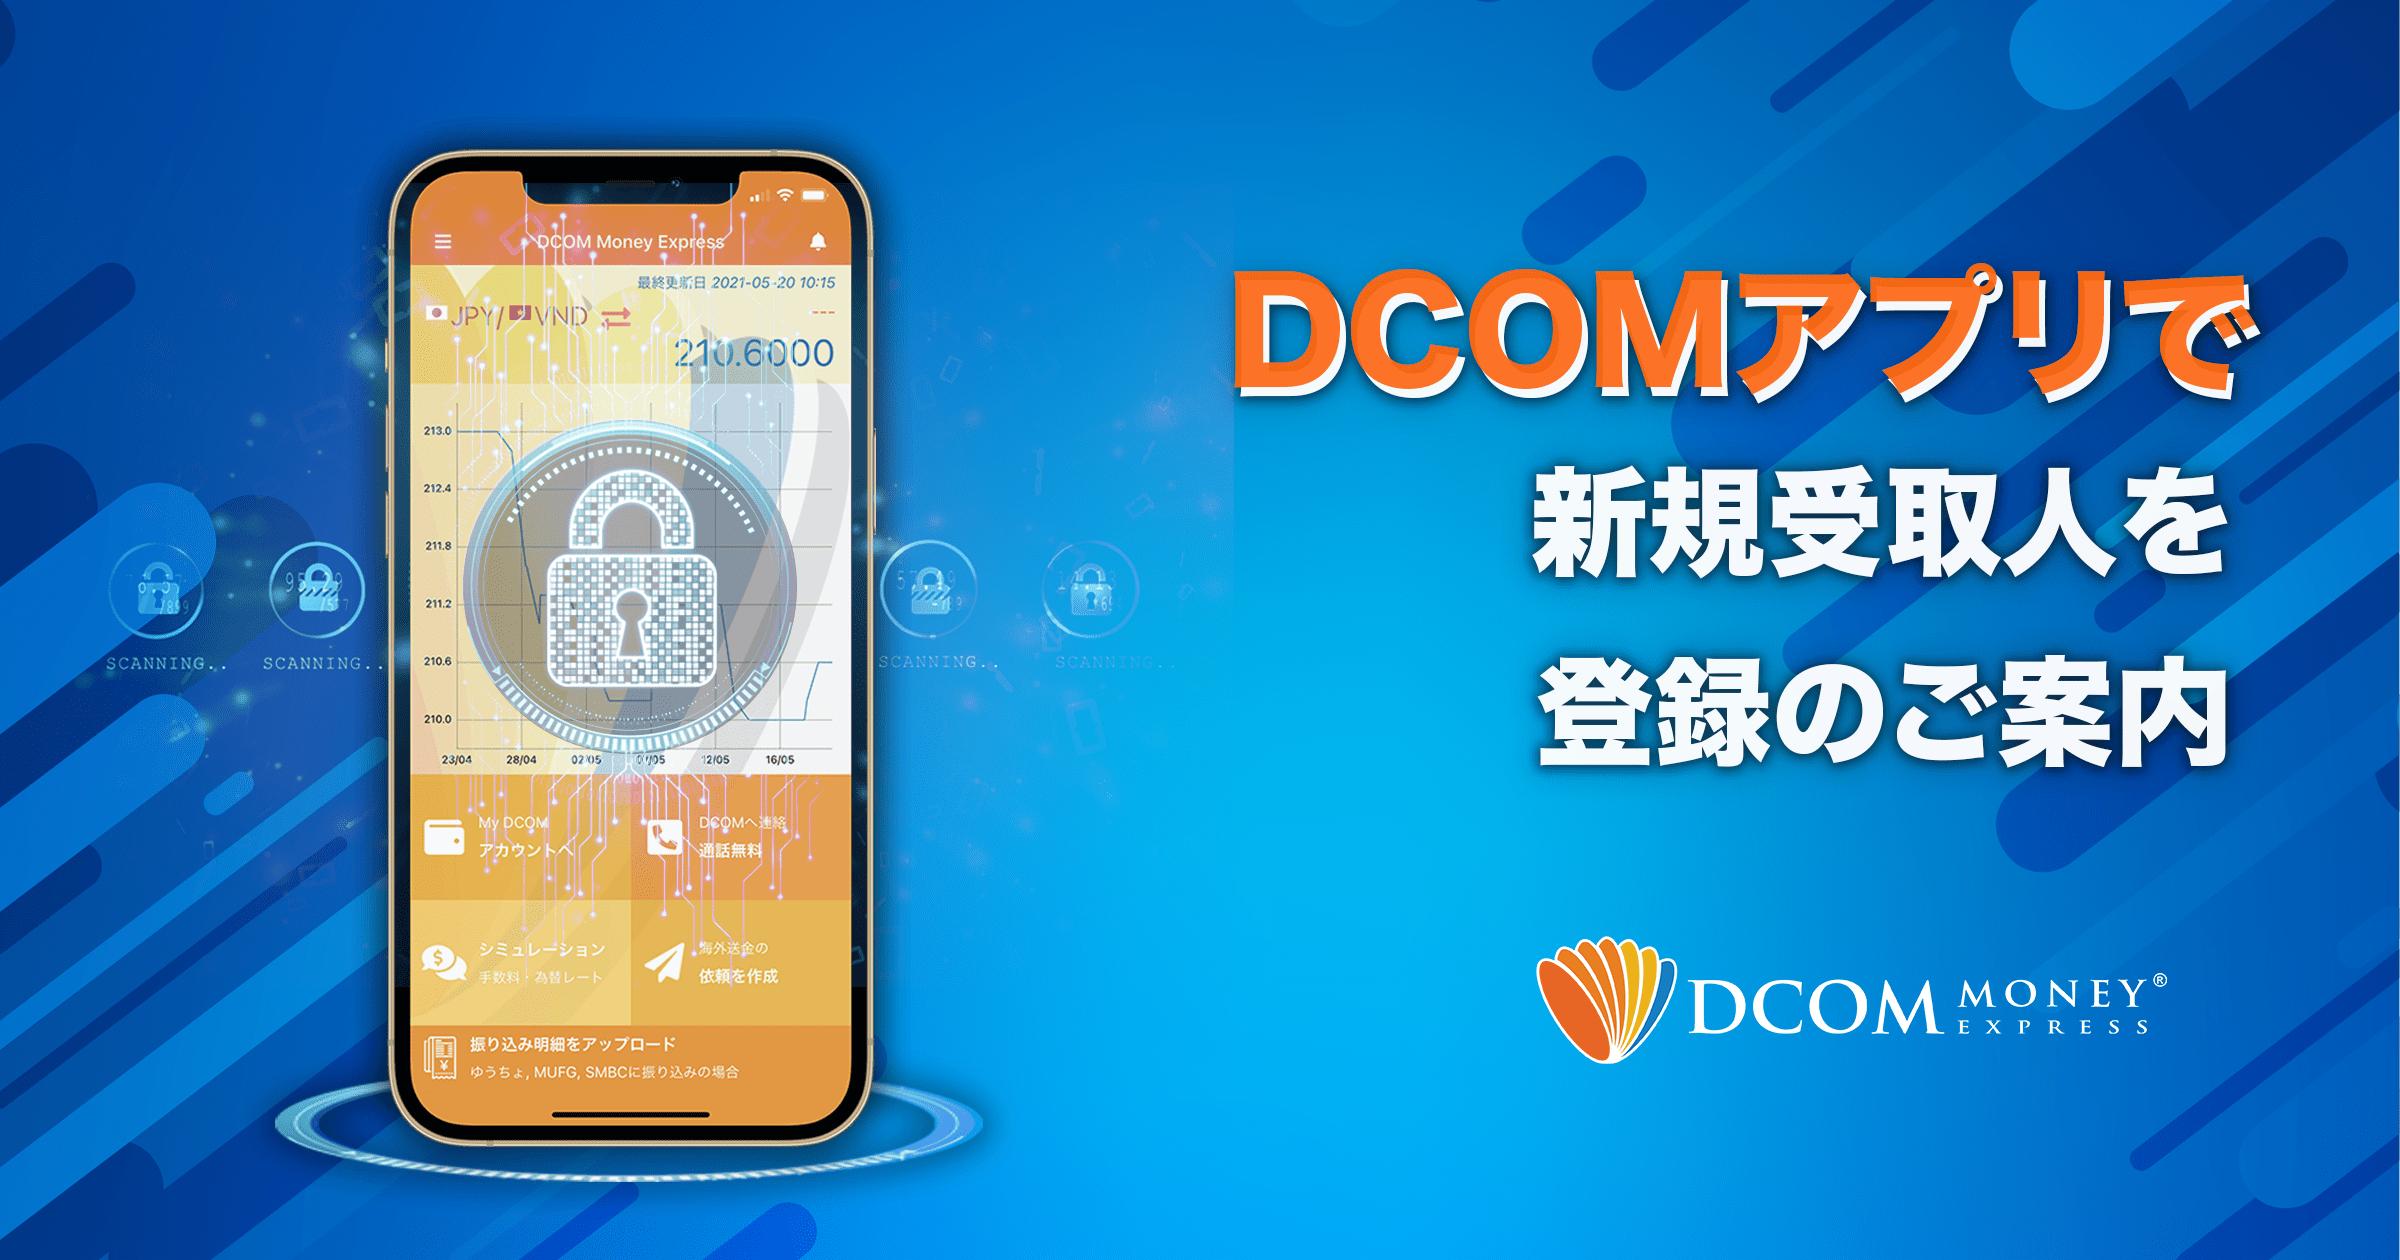 DCOMアプリで新規受取人を登録のご案内